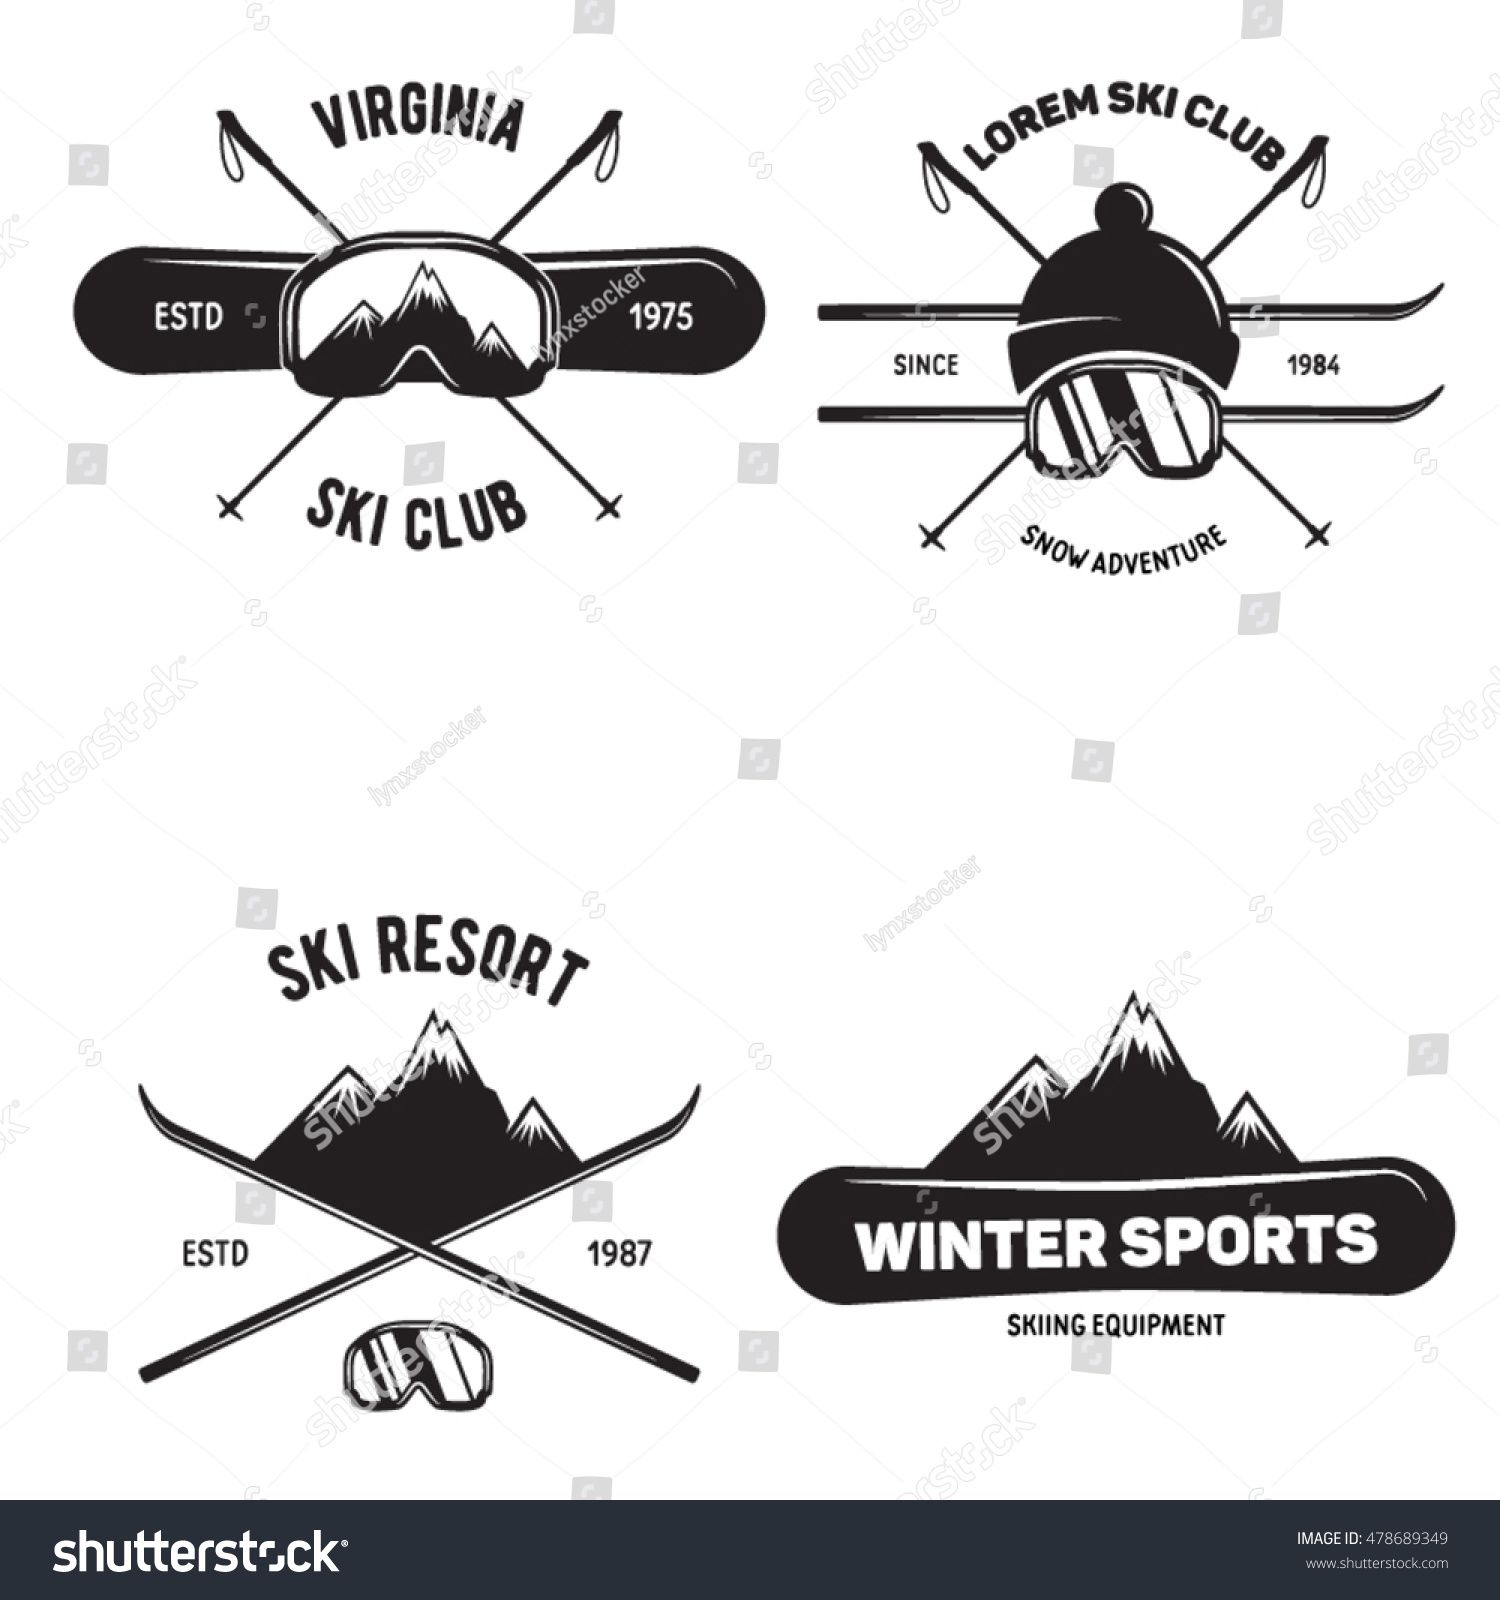 Set Of Ski Club Vintage Mountain Winter Badges Outdoor Adventure Logo Design Travel Hand Drawn And Hipster Insignia Snowboard Icon Ski Art Ski Club Skiing